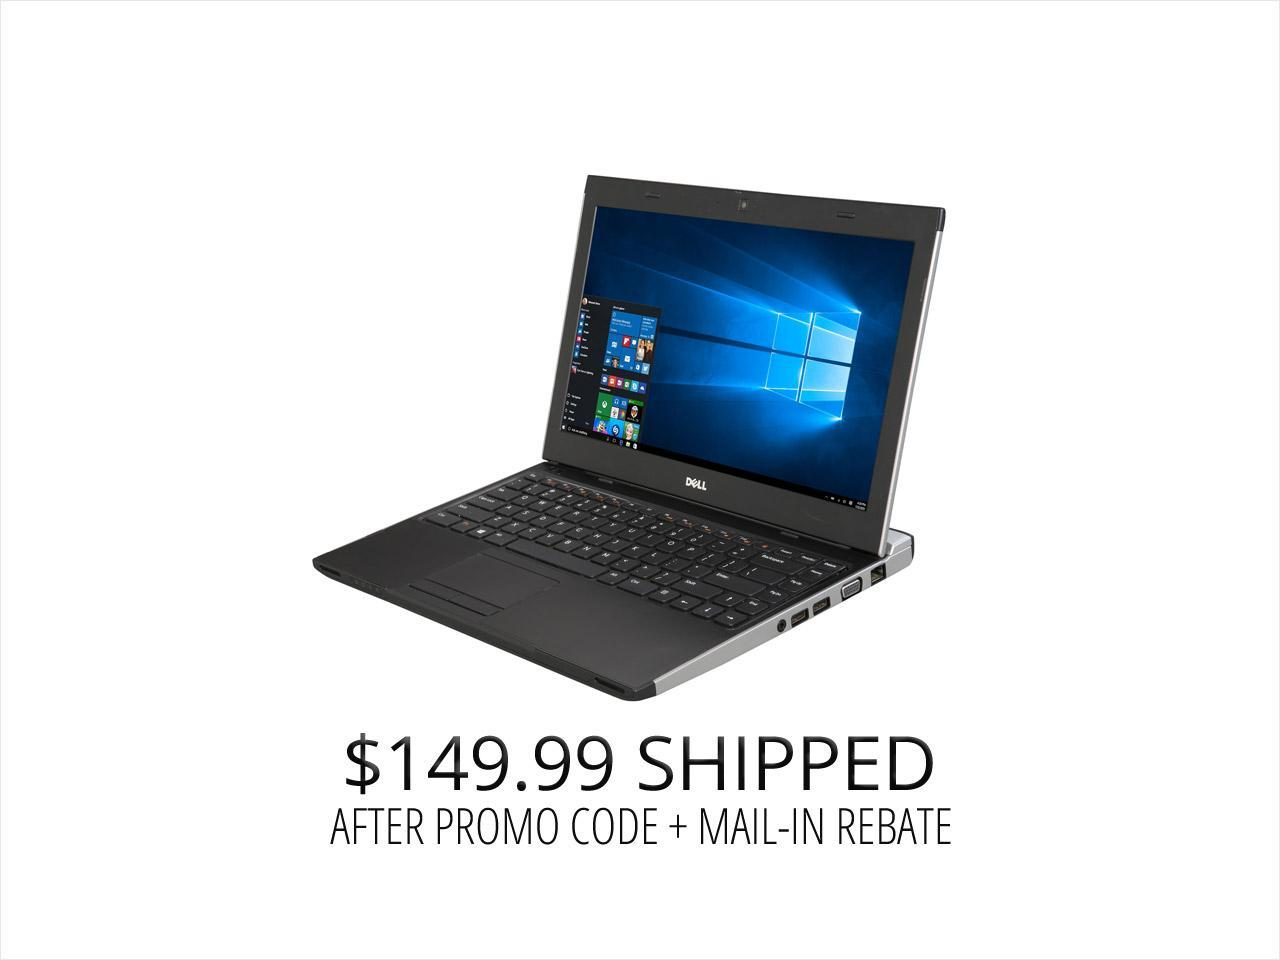 "Refurbished: DELL Laptop 3330 Intel Core i5 3rd Gen 3337U (1.80 GHz) 4 GB Memory 250 GB HDD 13.3"" Windows 10 Pro"